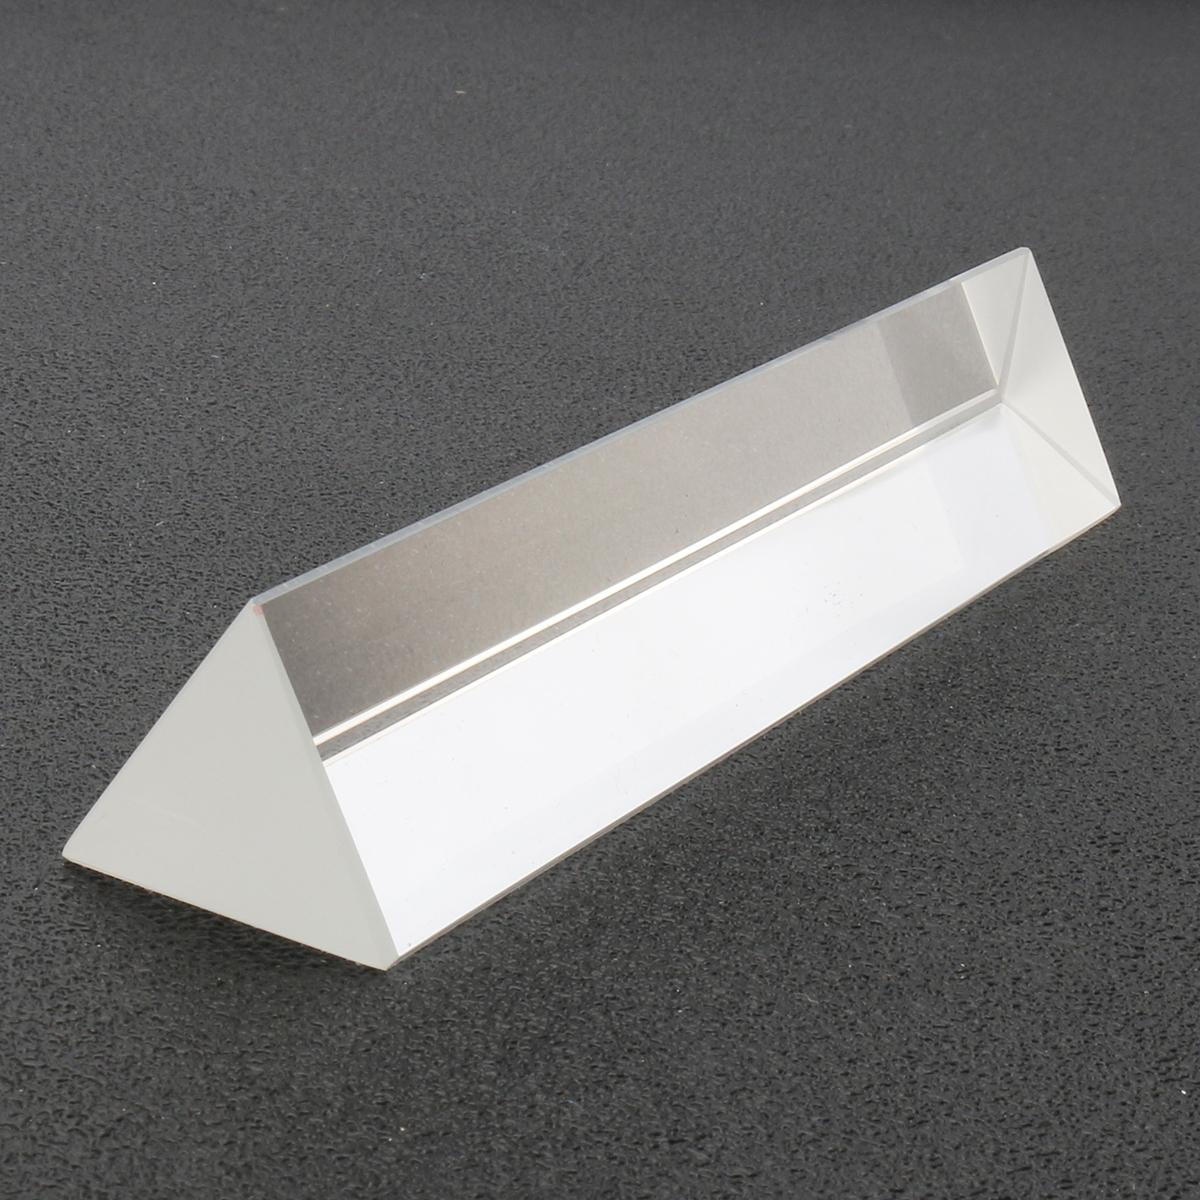 6 Inch Optical Glass Triple Triangular Prism In Box Physics Teaching Light Spectrum Sale